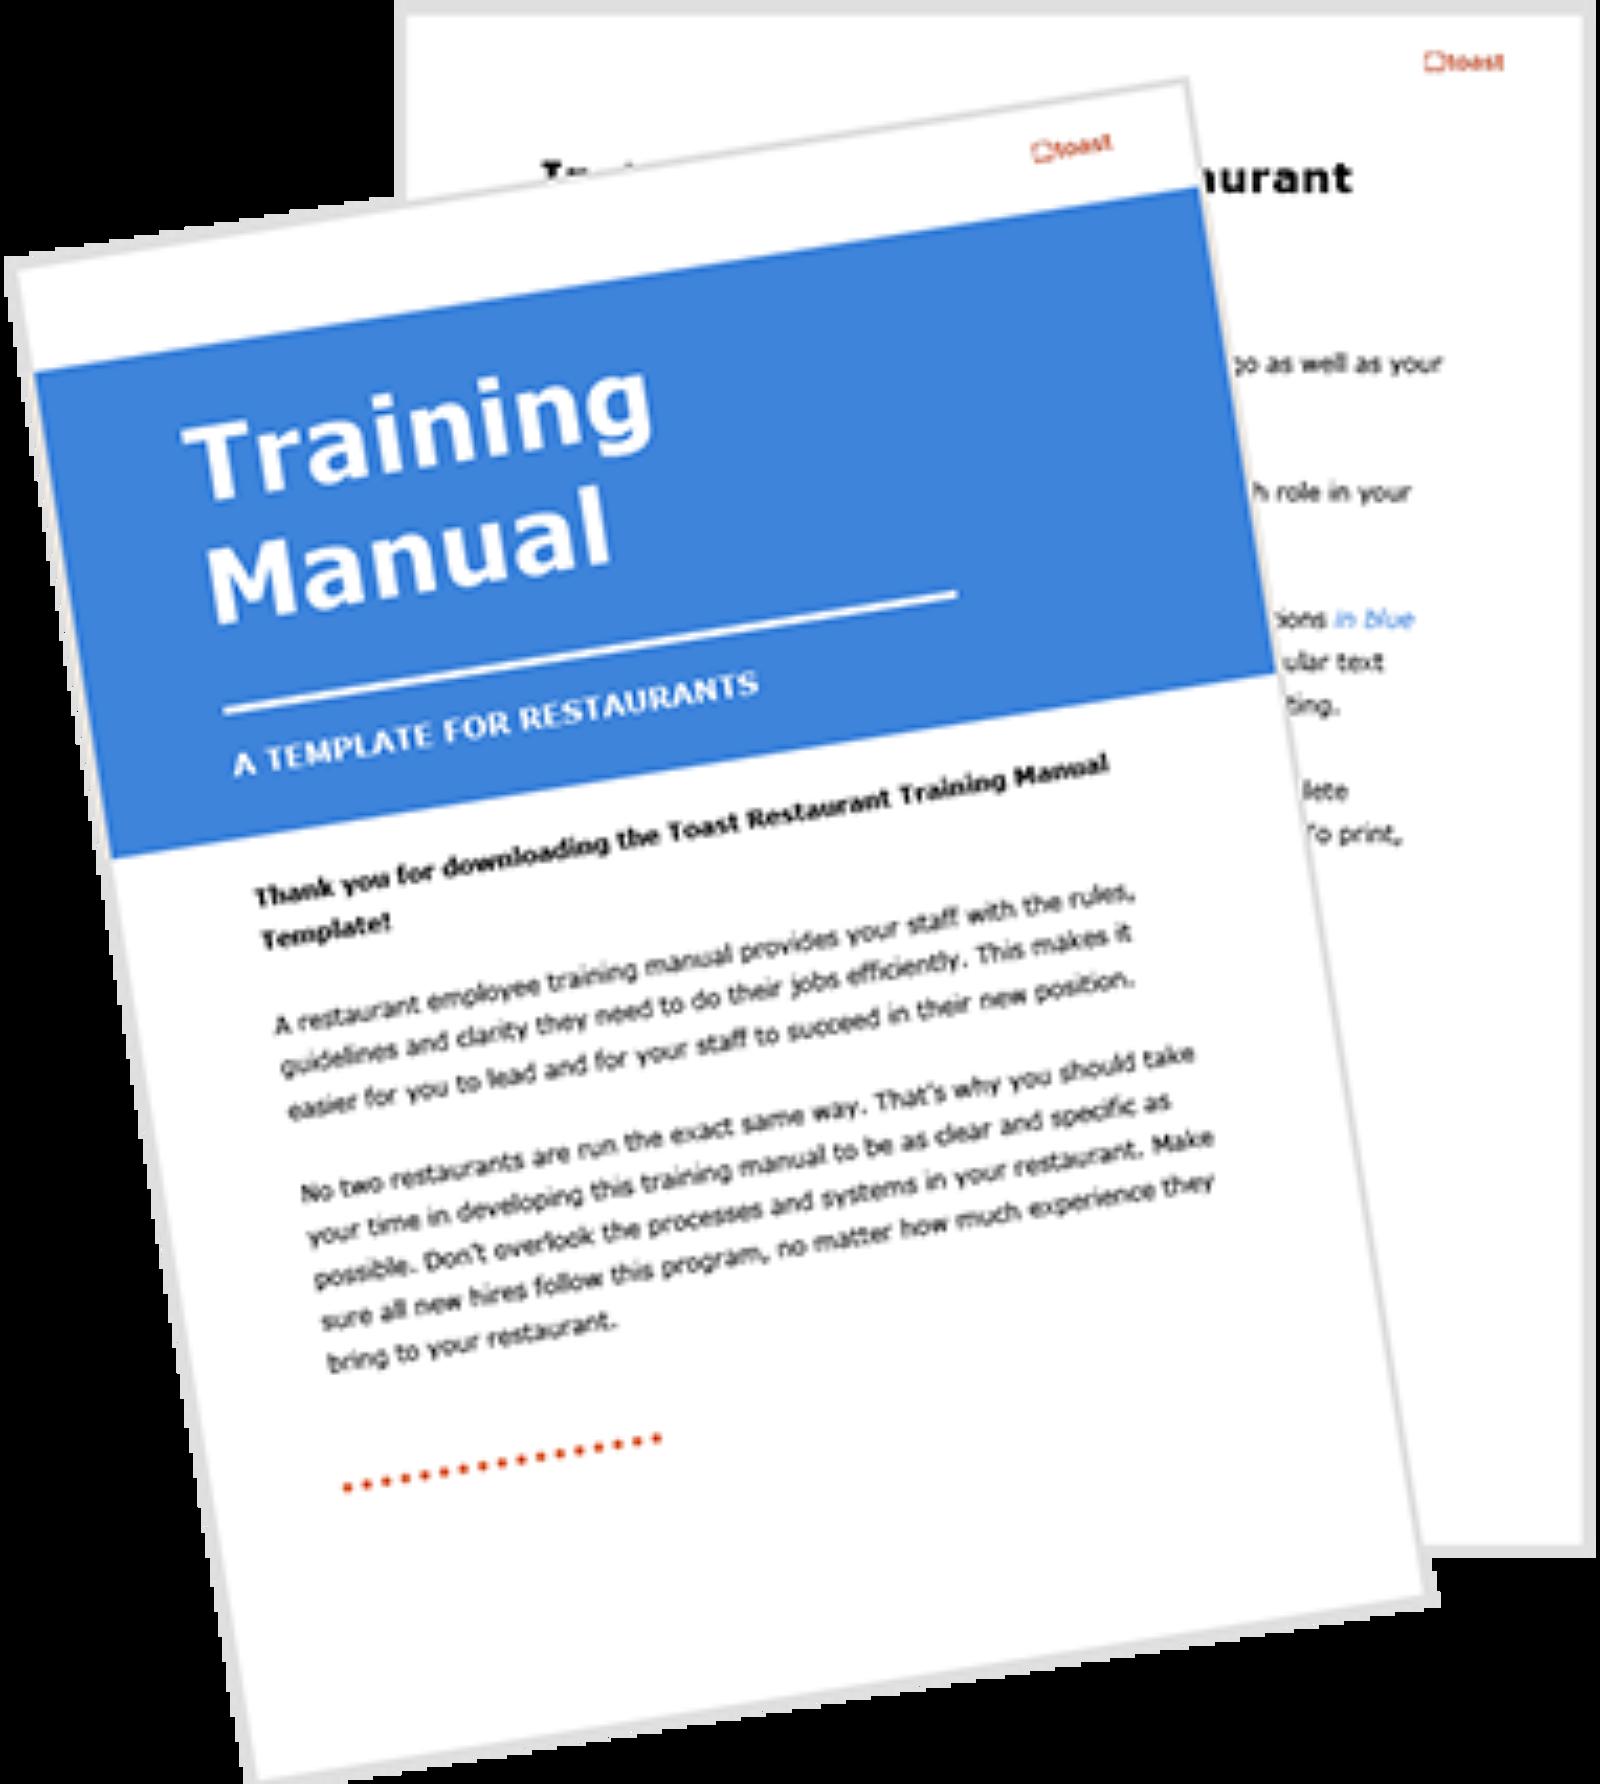 Training manual template